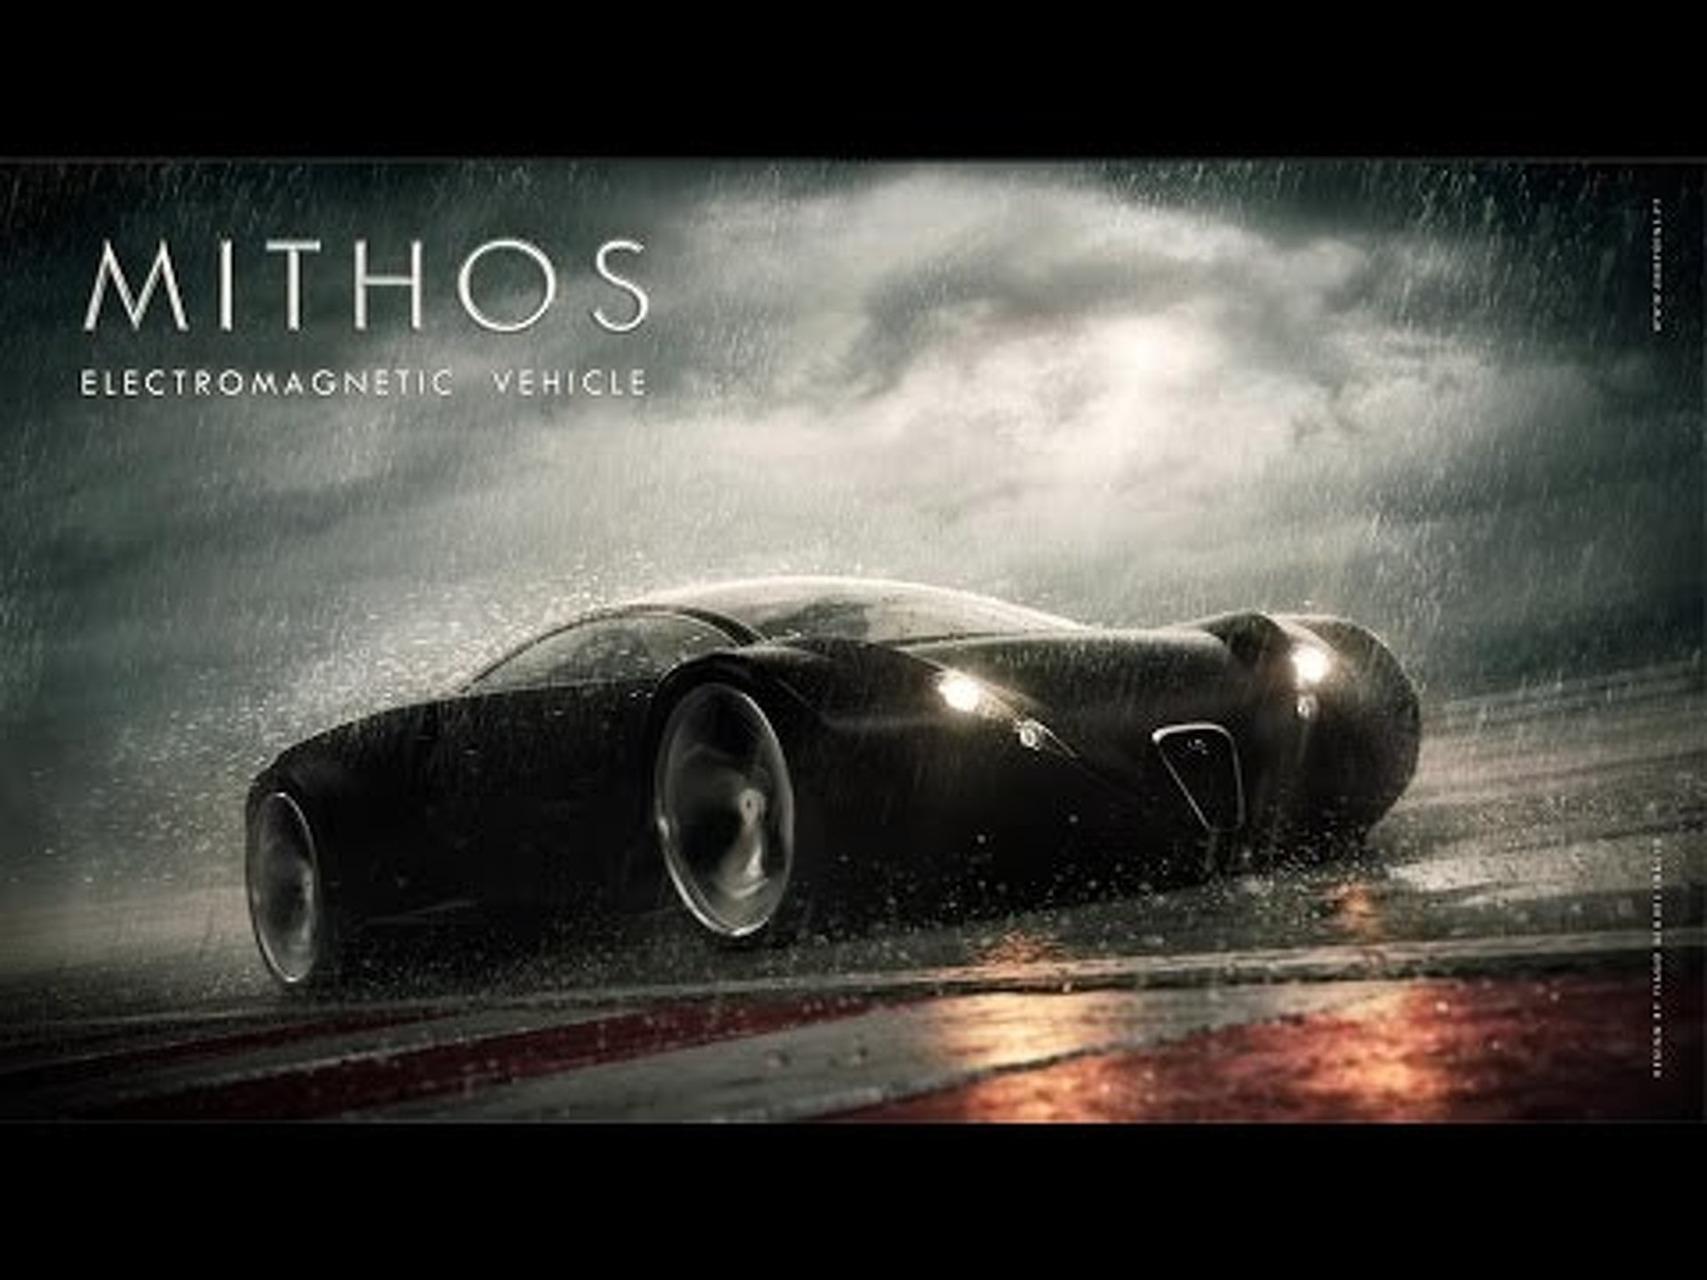 MITHOS - ELECTROMAGNETIC VEHICLE